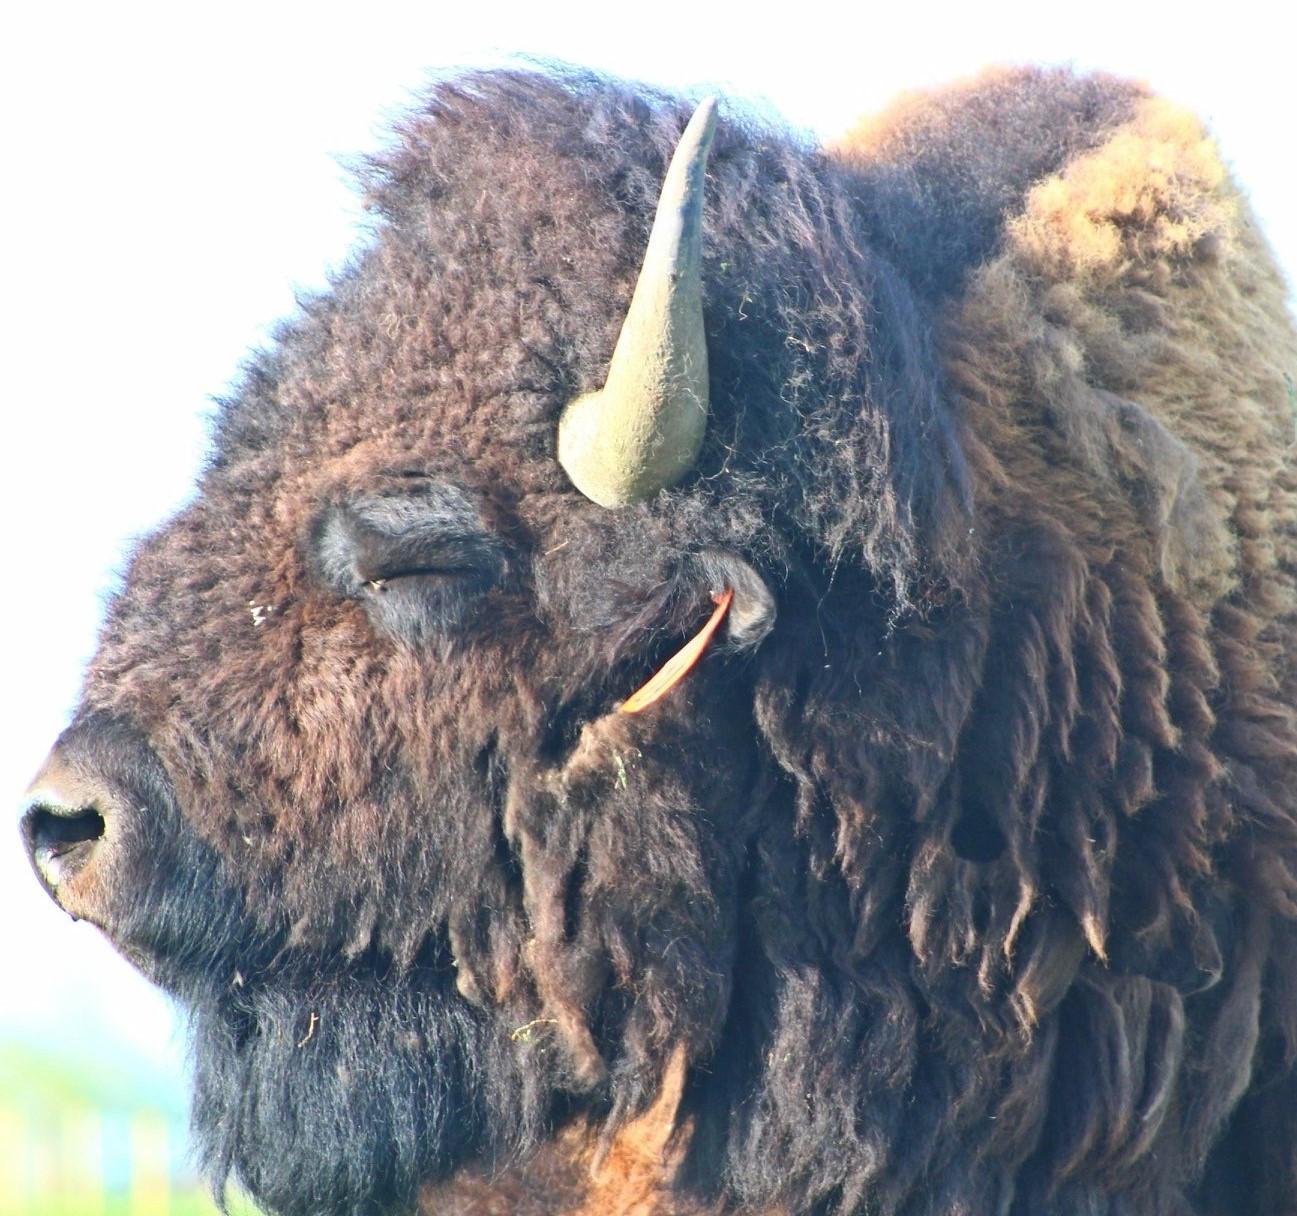 Bison bull Wilbur enjoying the sun